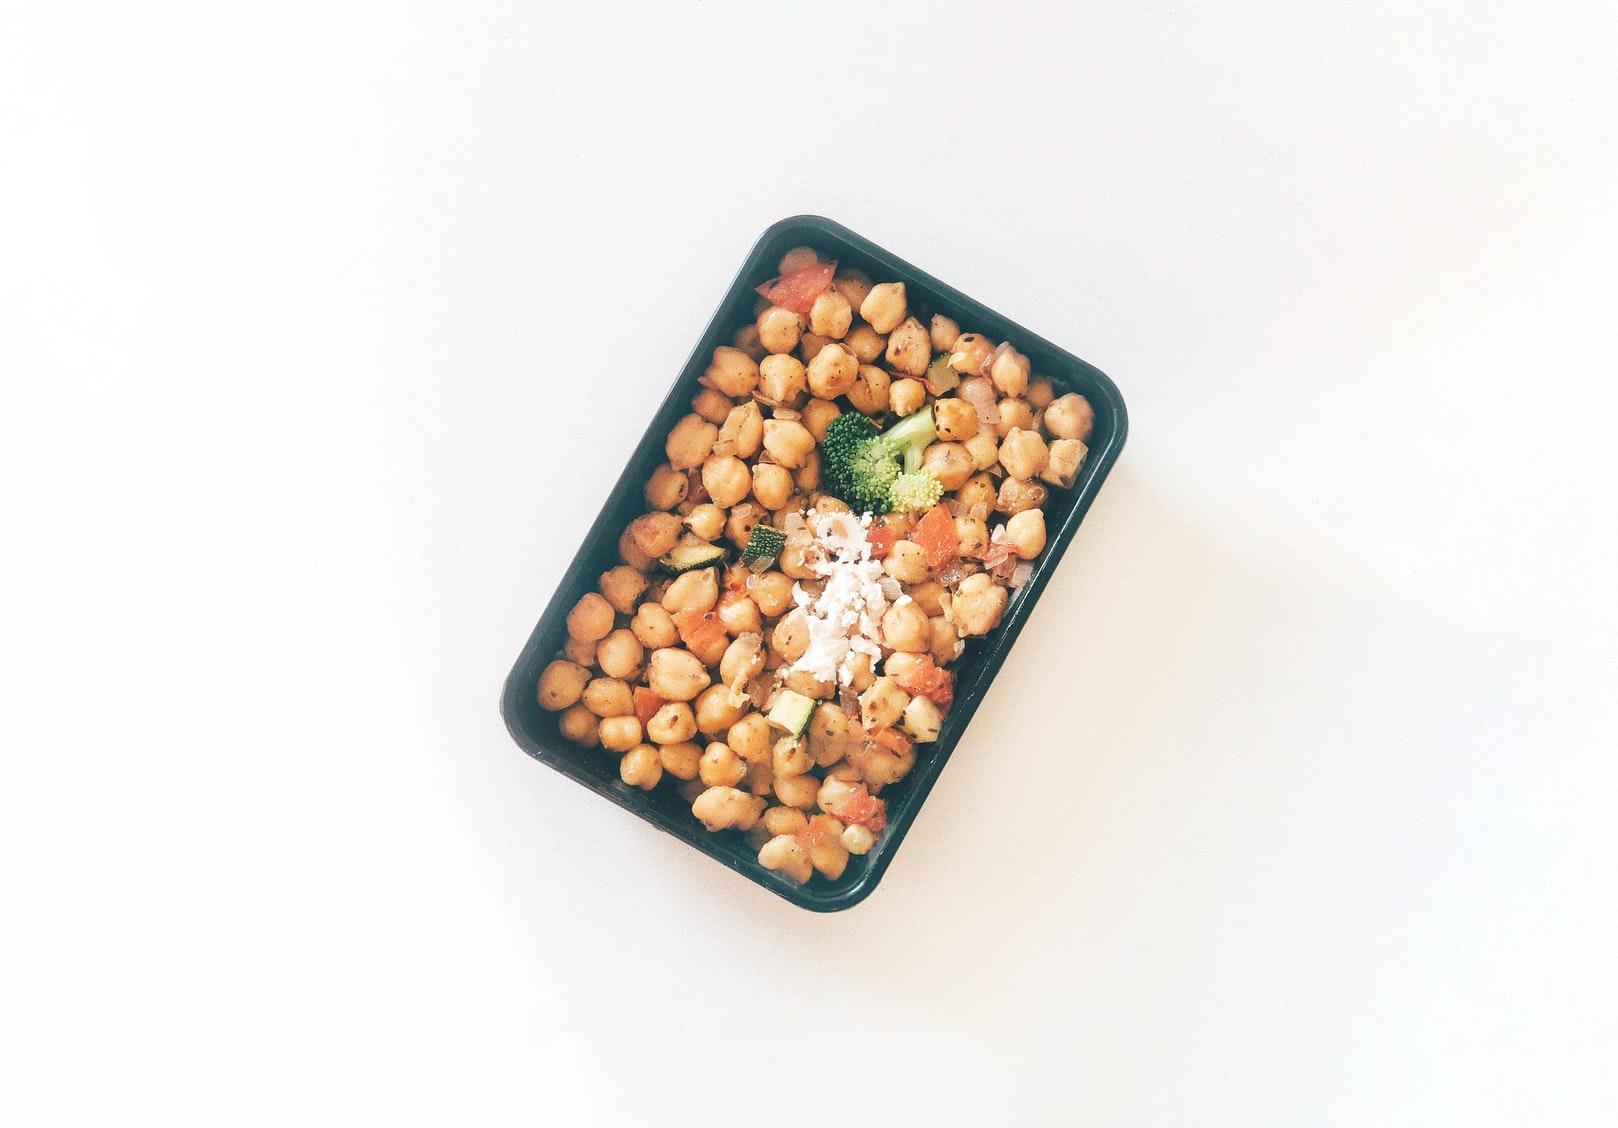 Confira algumas fontes de proteína vegetal!